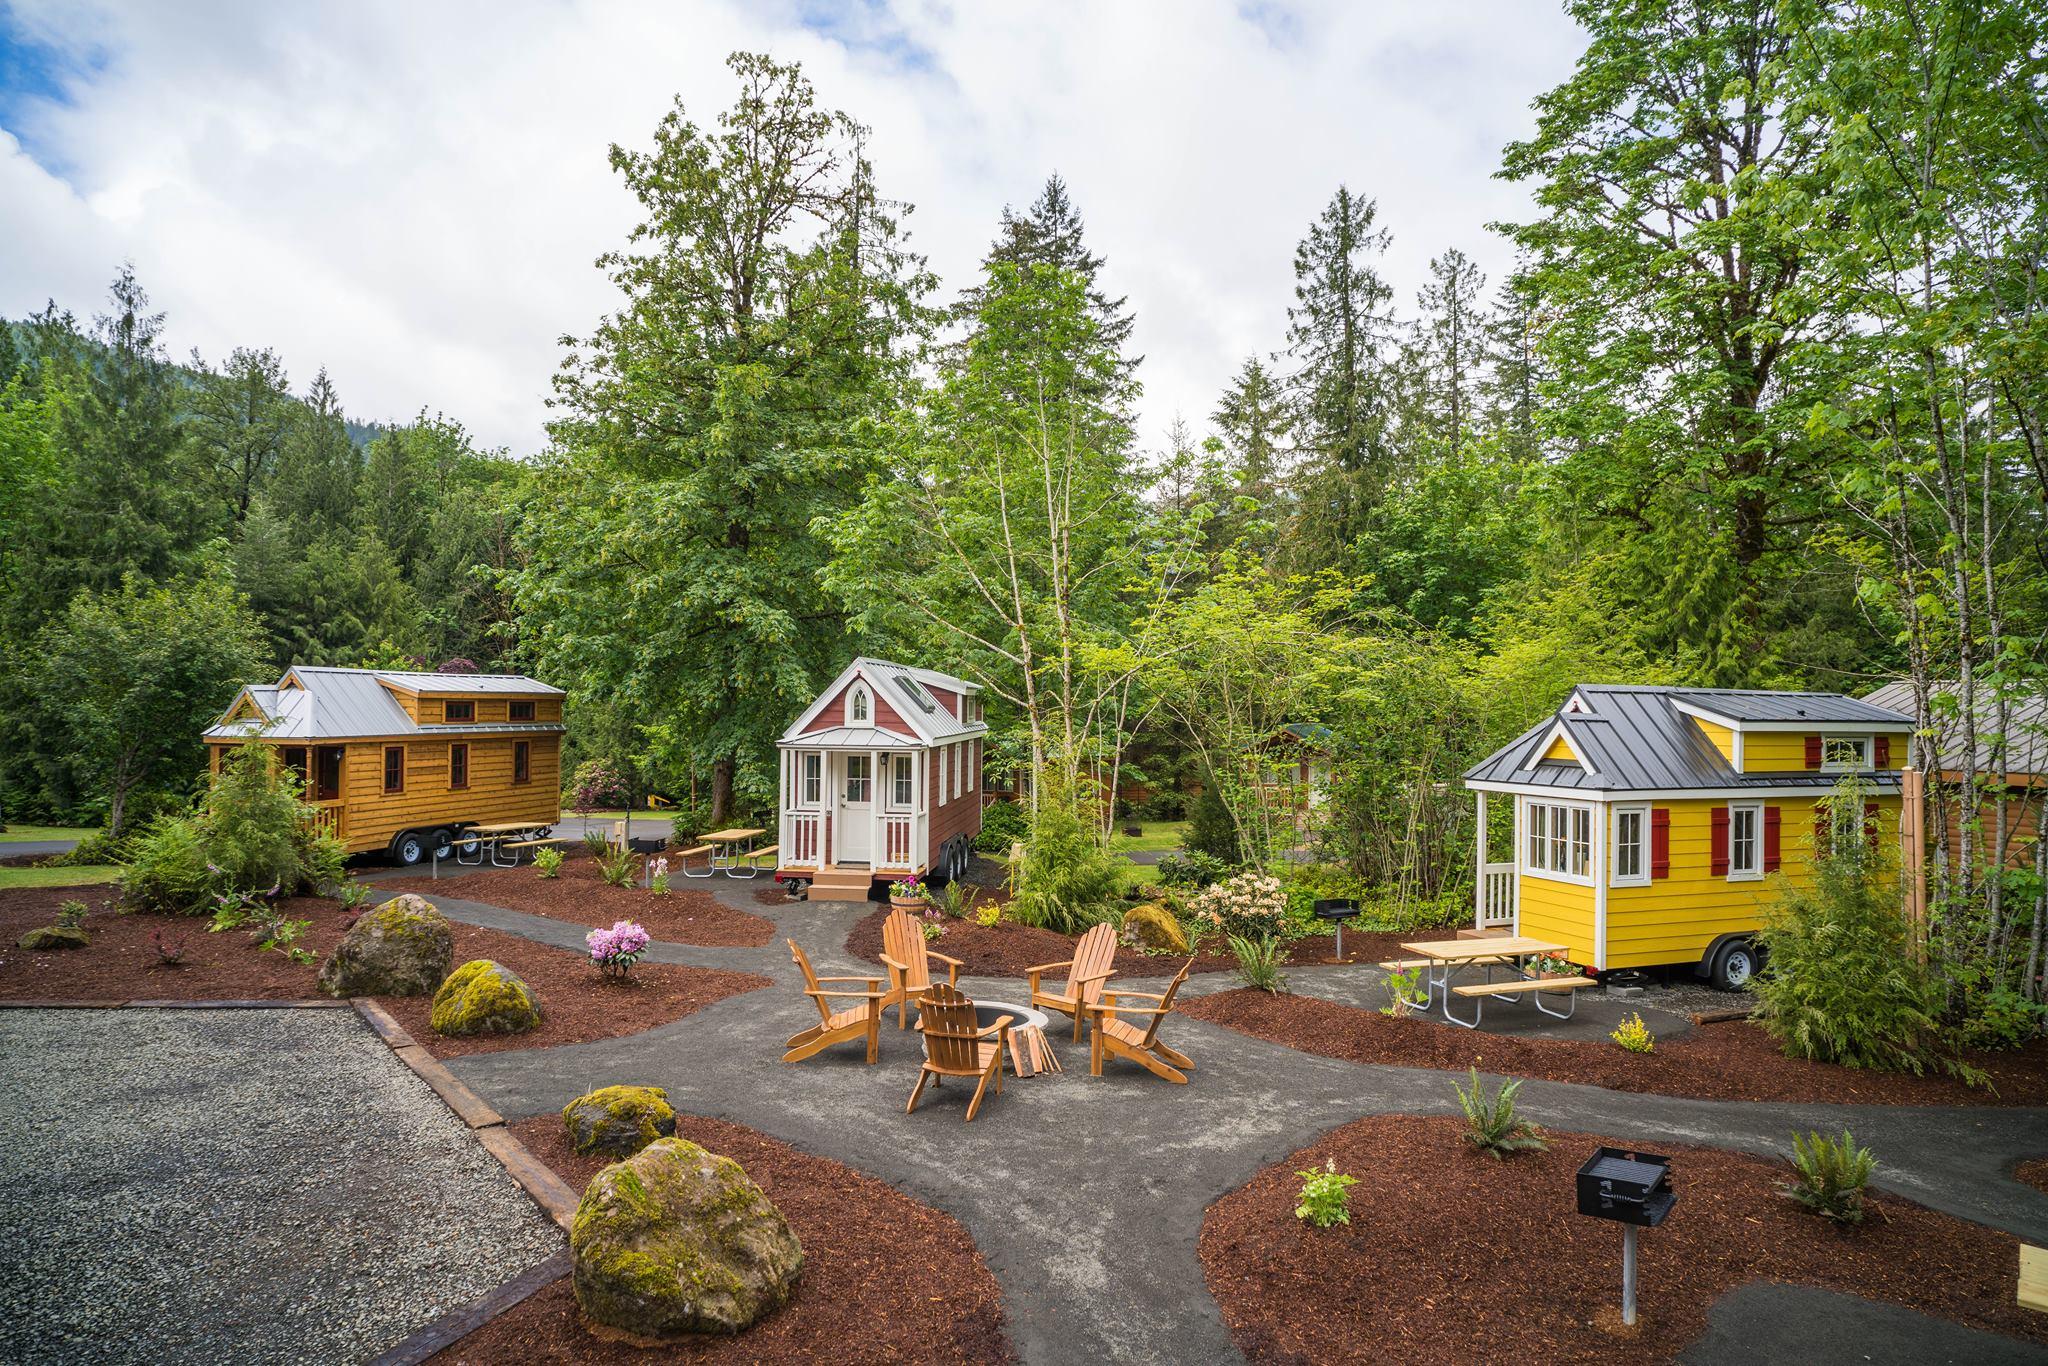 7/Mt. Hood Tiny House Village